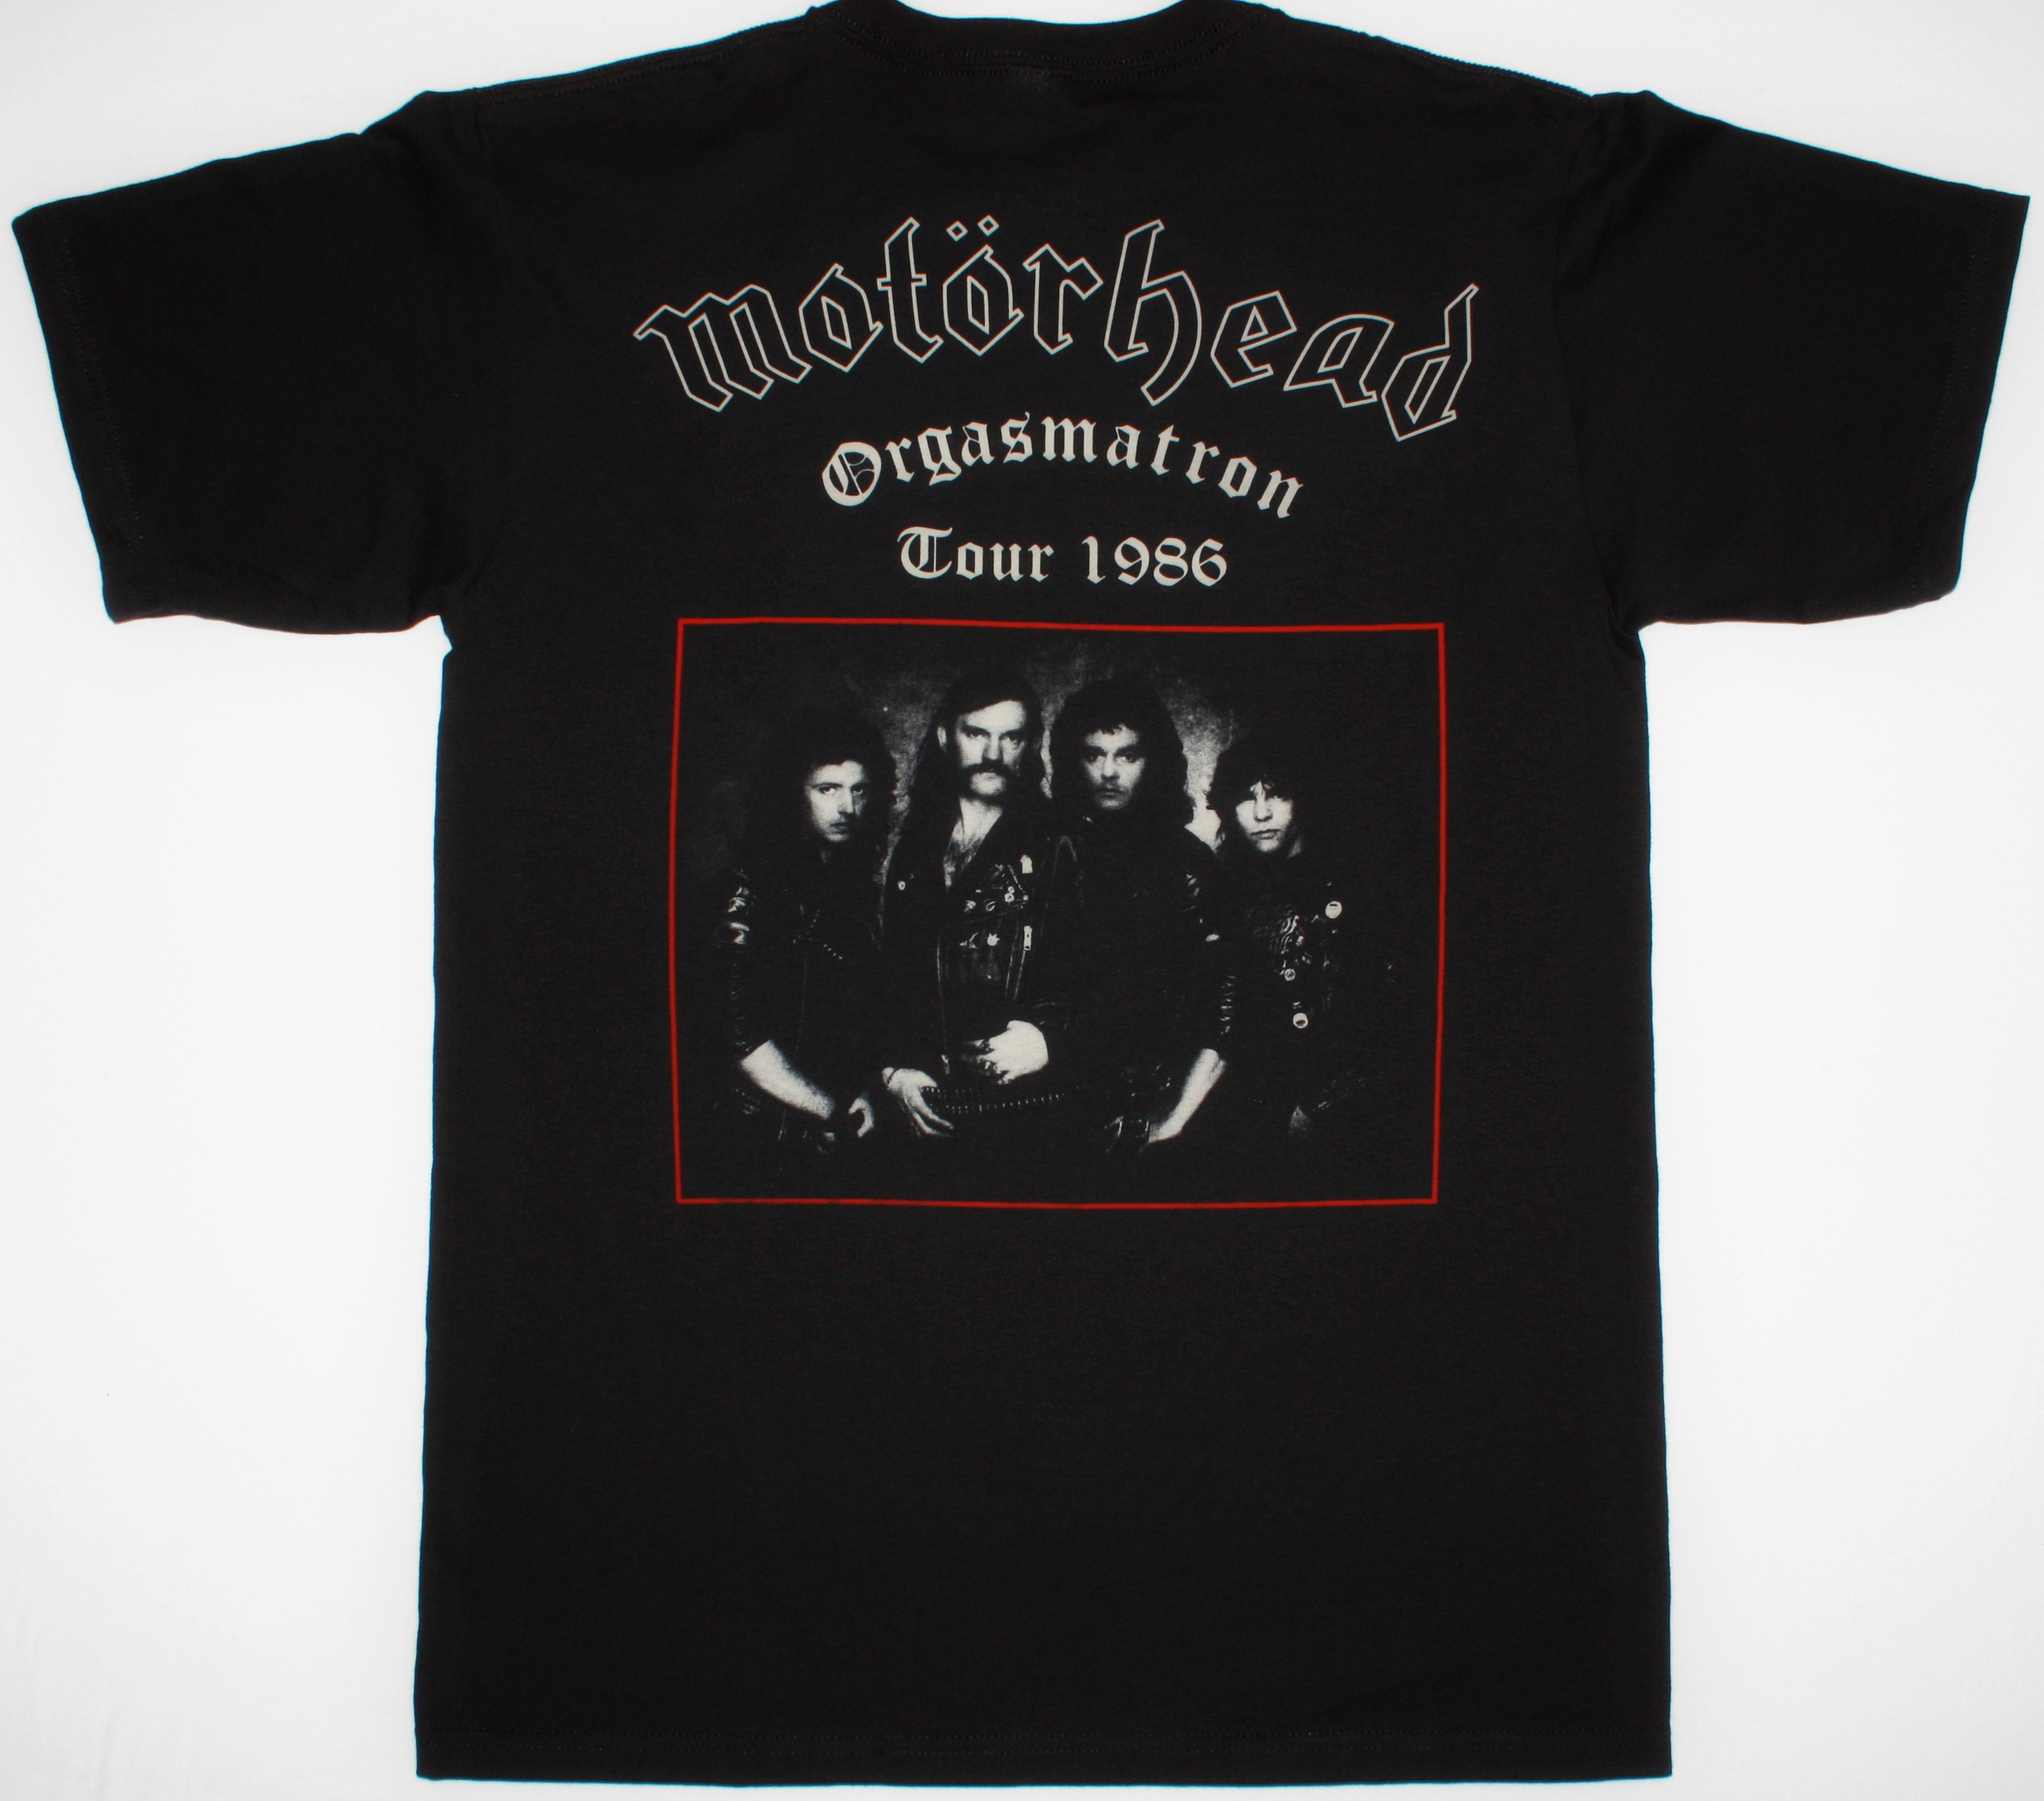 MOTORHEAD ORGASMATRON TOUR 1986 NEW BLACK T-SHIRT